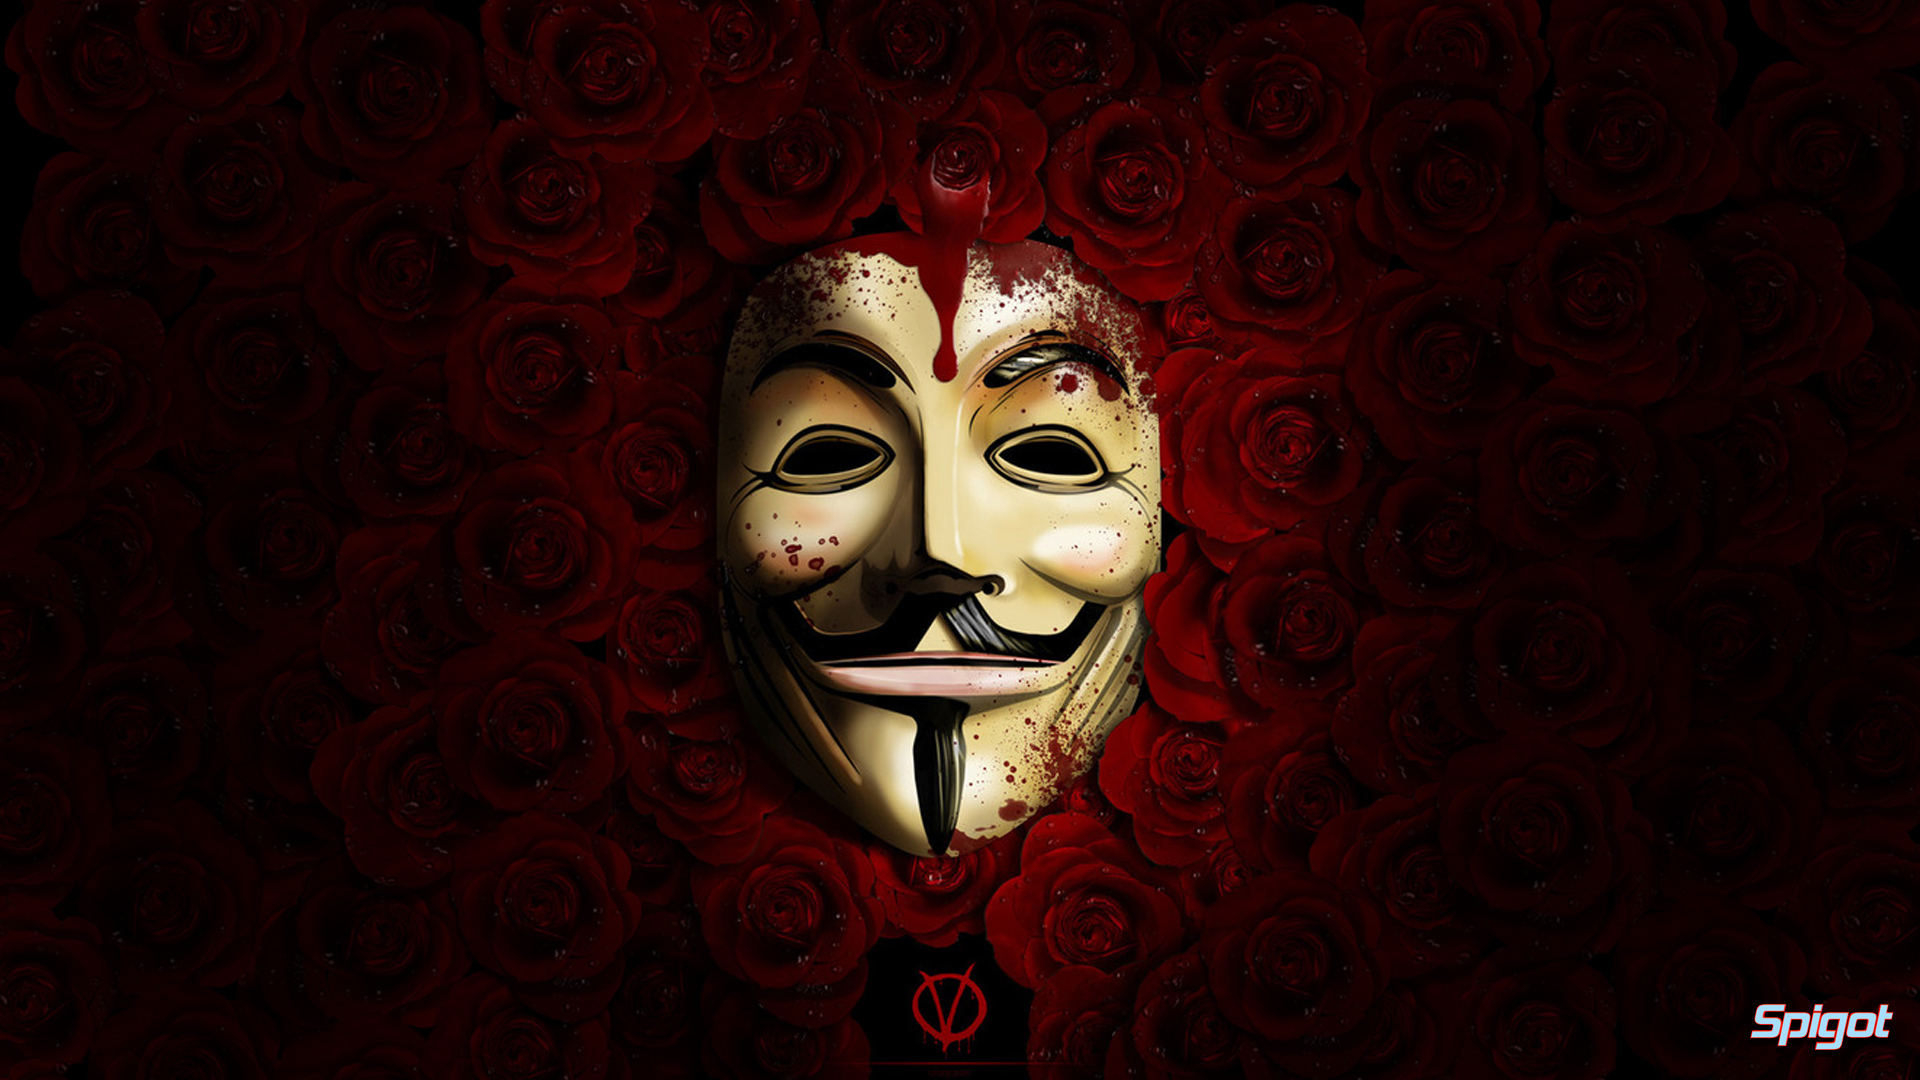 V For Vendetta Group 7 By Binapalk On Emaze